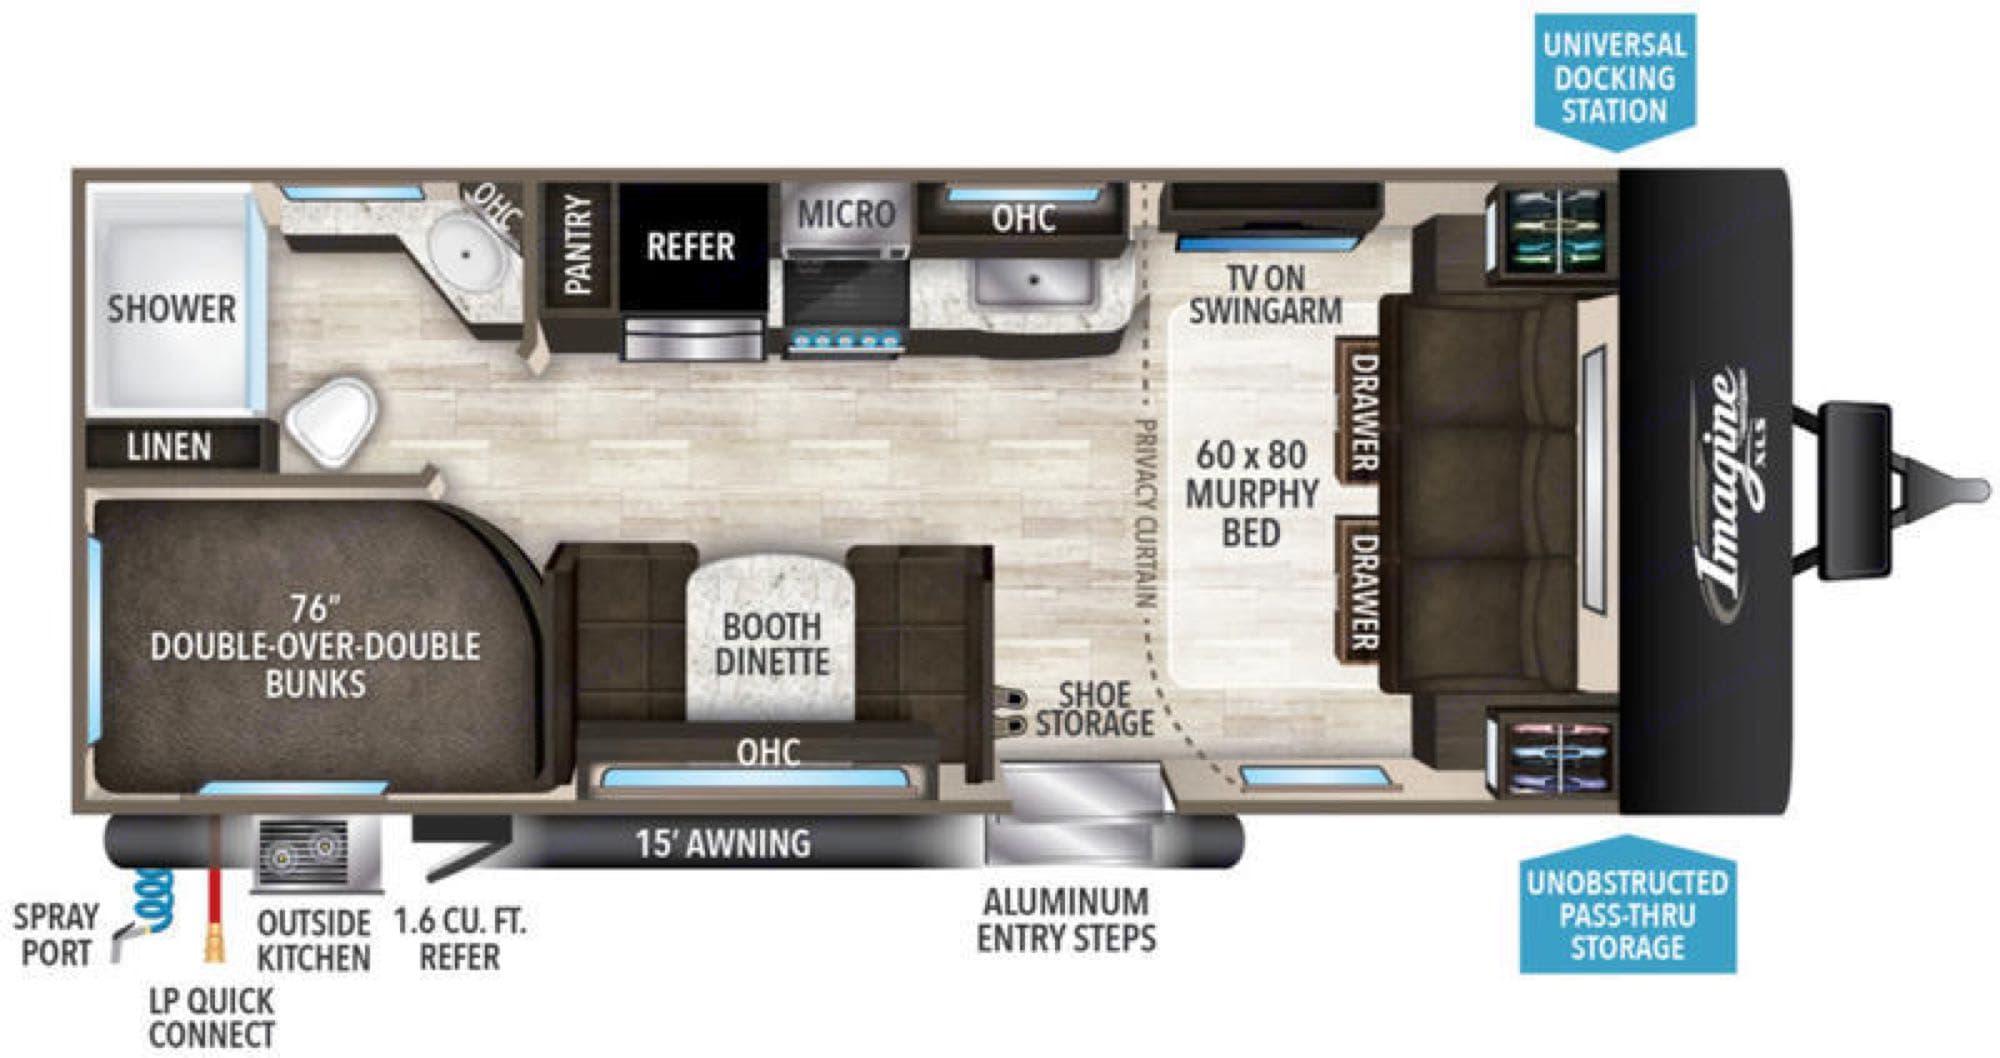 Imagine XLS floor plan. Grand Design Imagine XLS Bunkhouse 2019